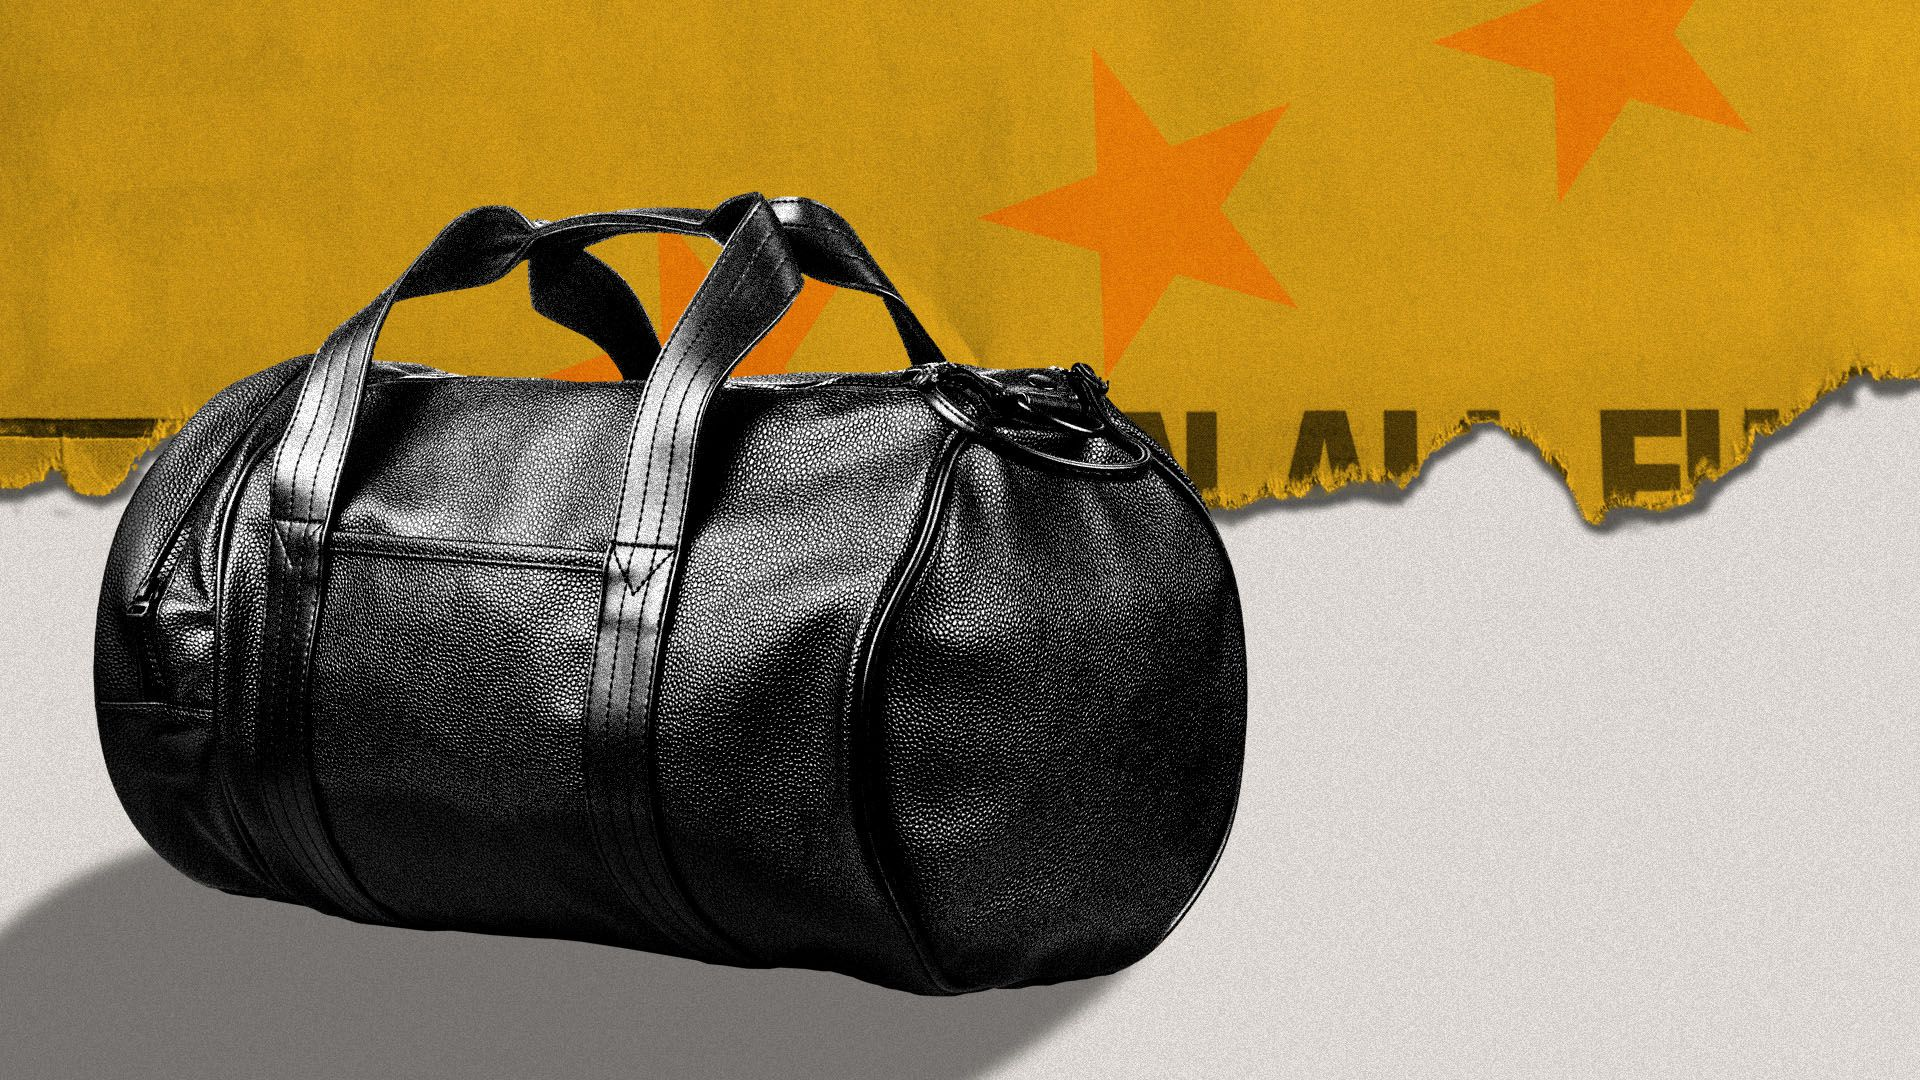 Illustration of a duffel bag